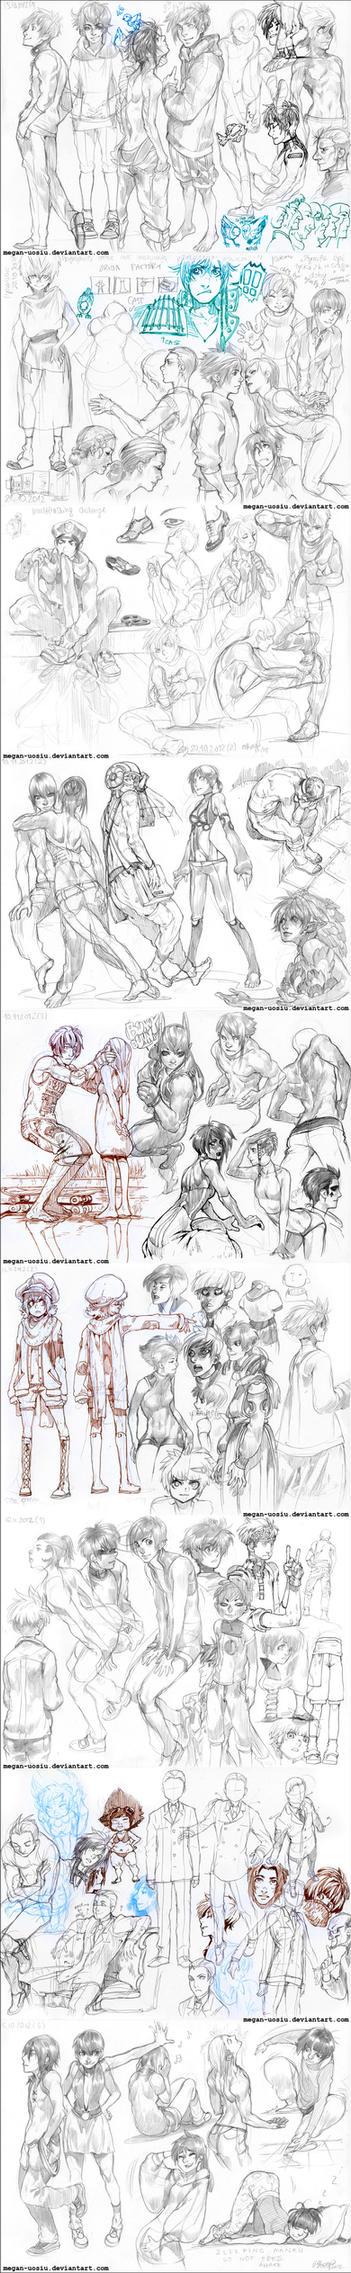 Sketches_050 by Megan-Uosiu